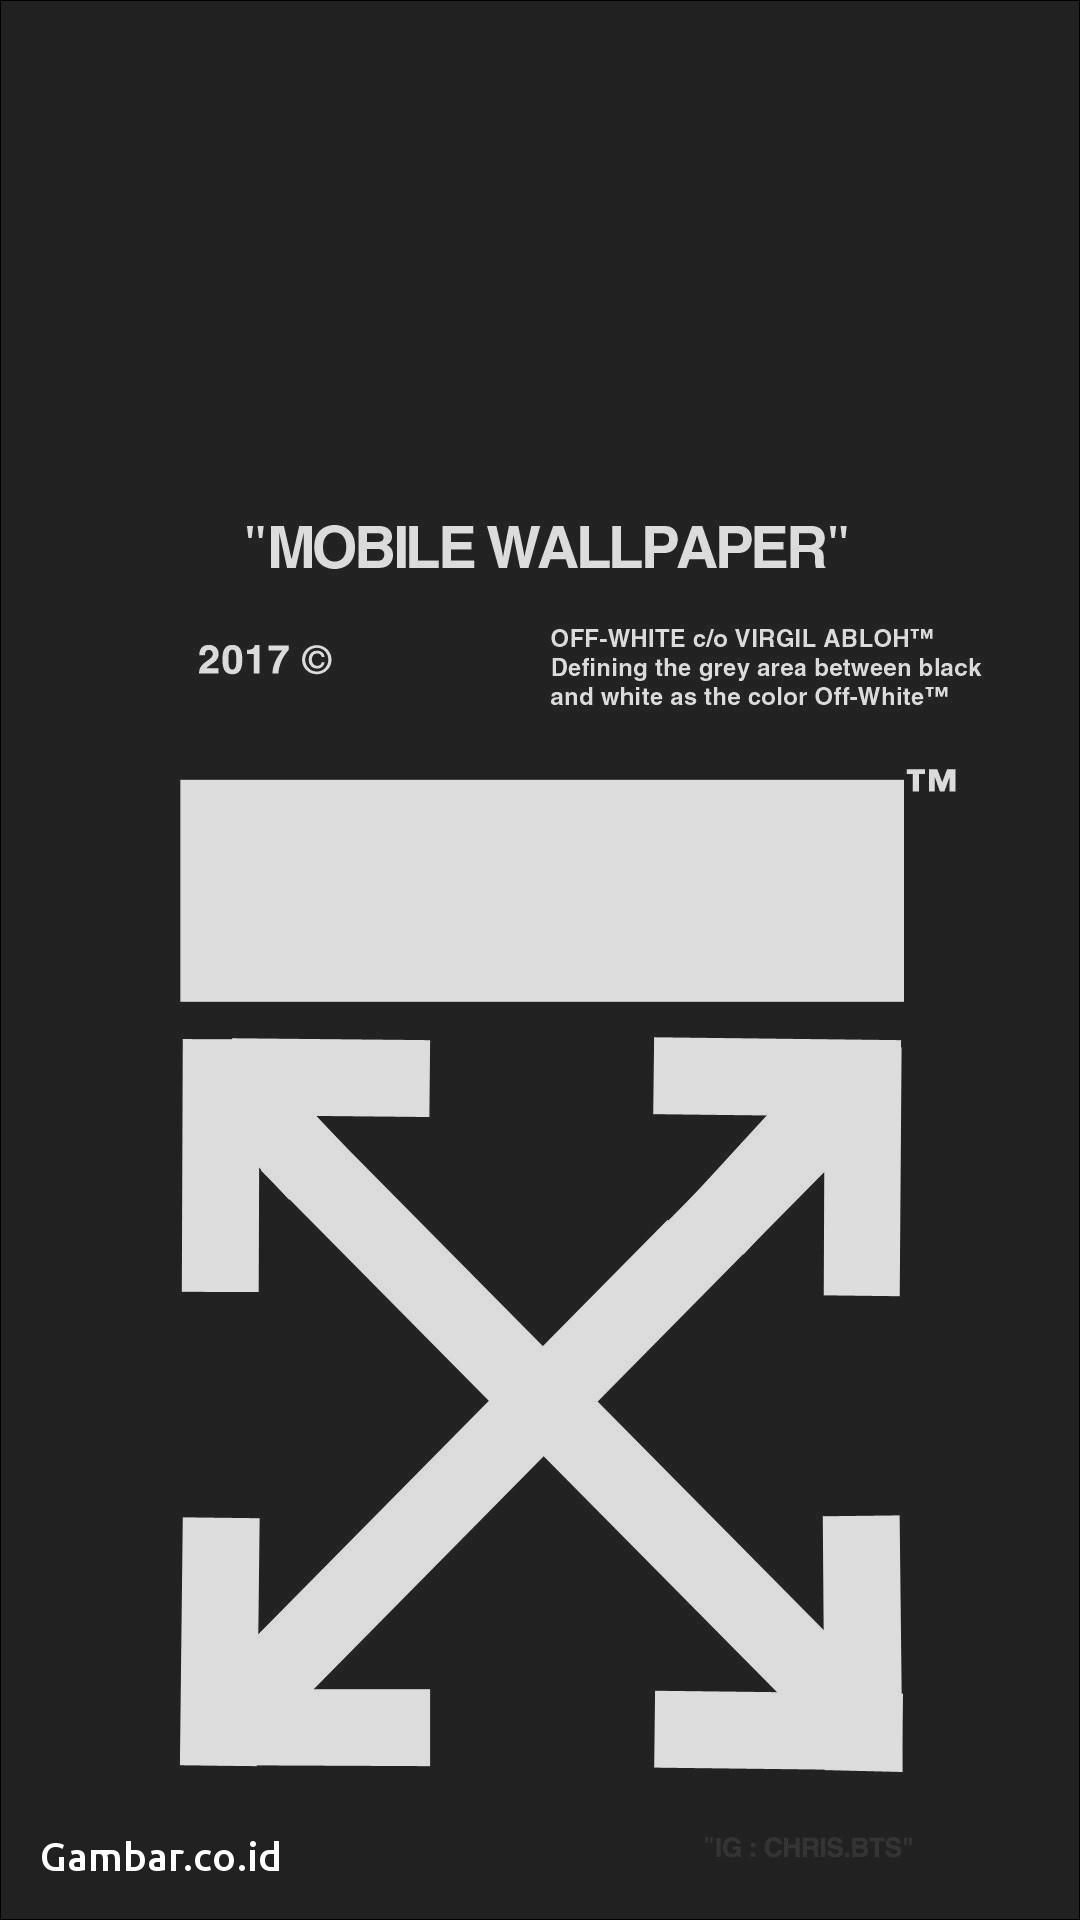 wallpaper iphone adidas off white black